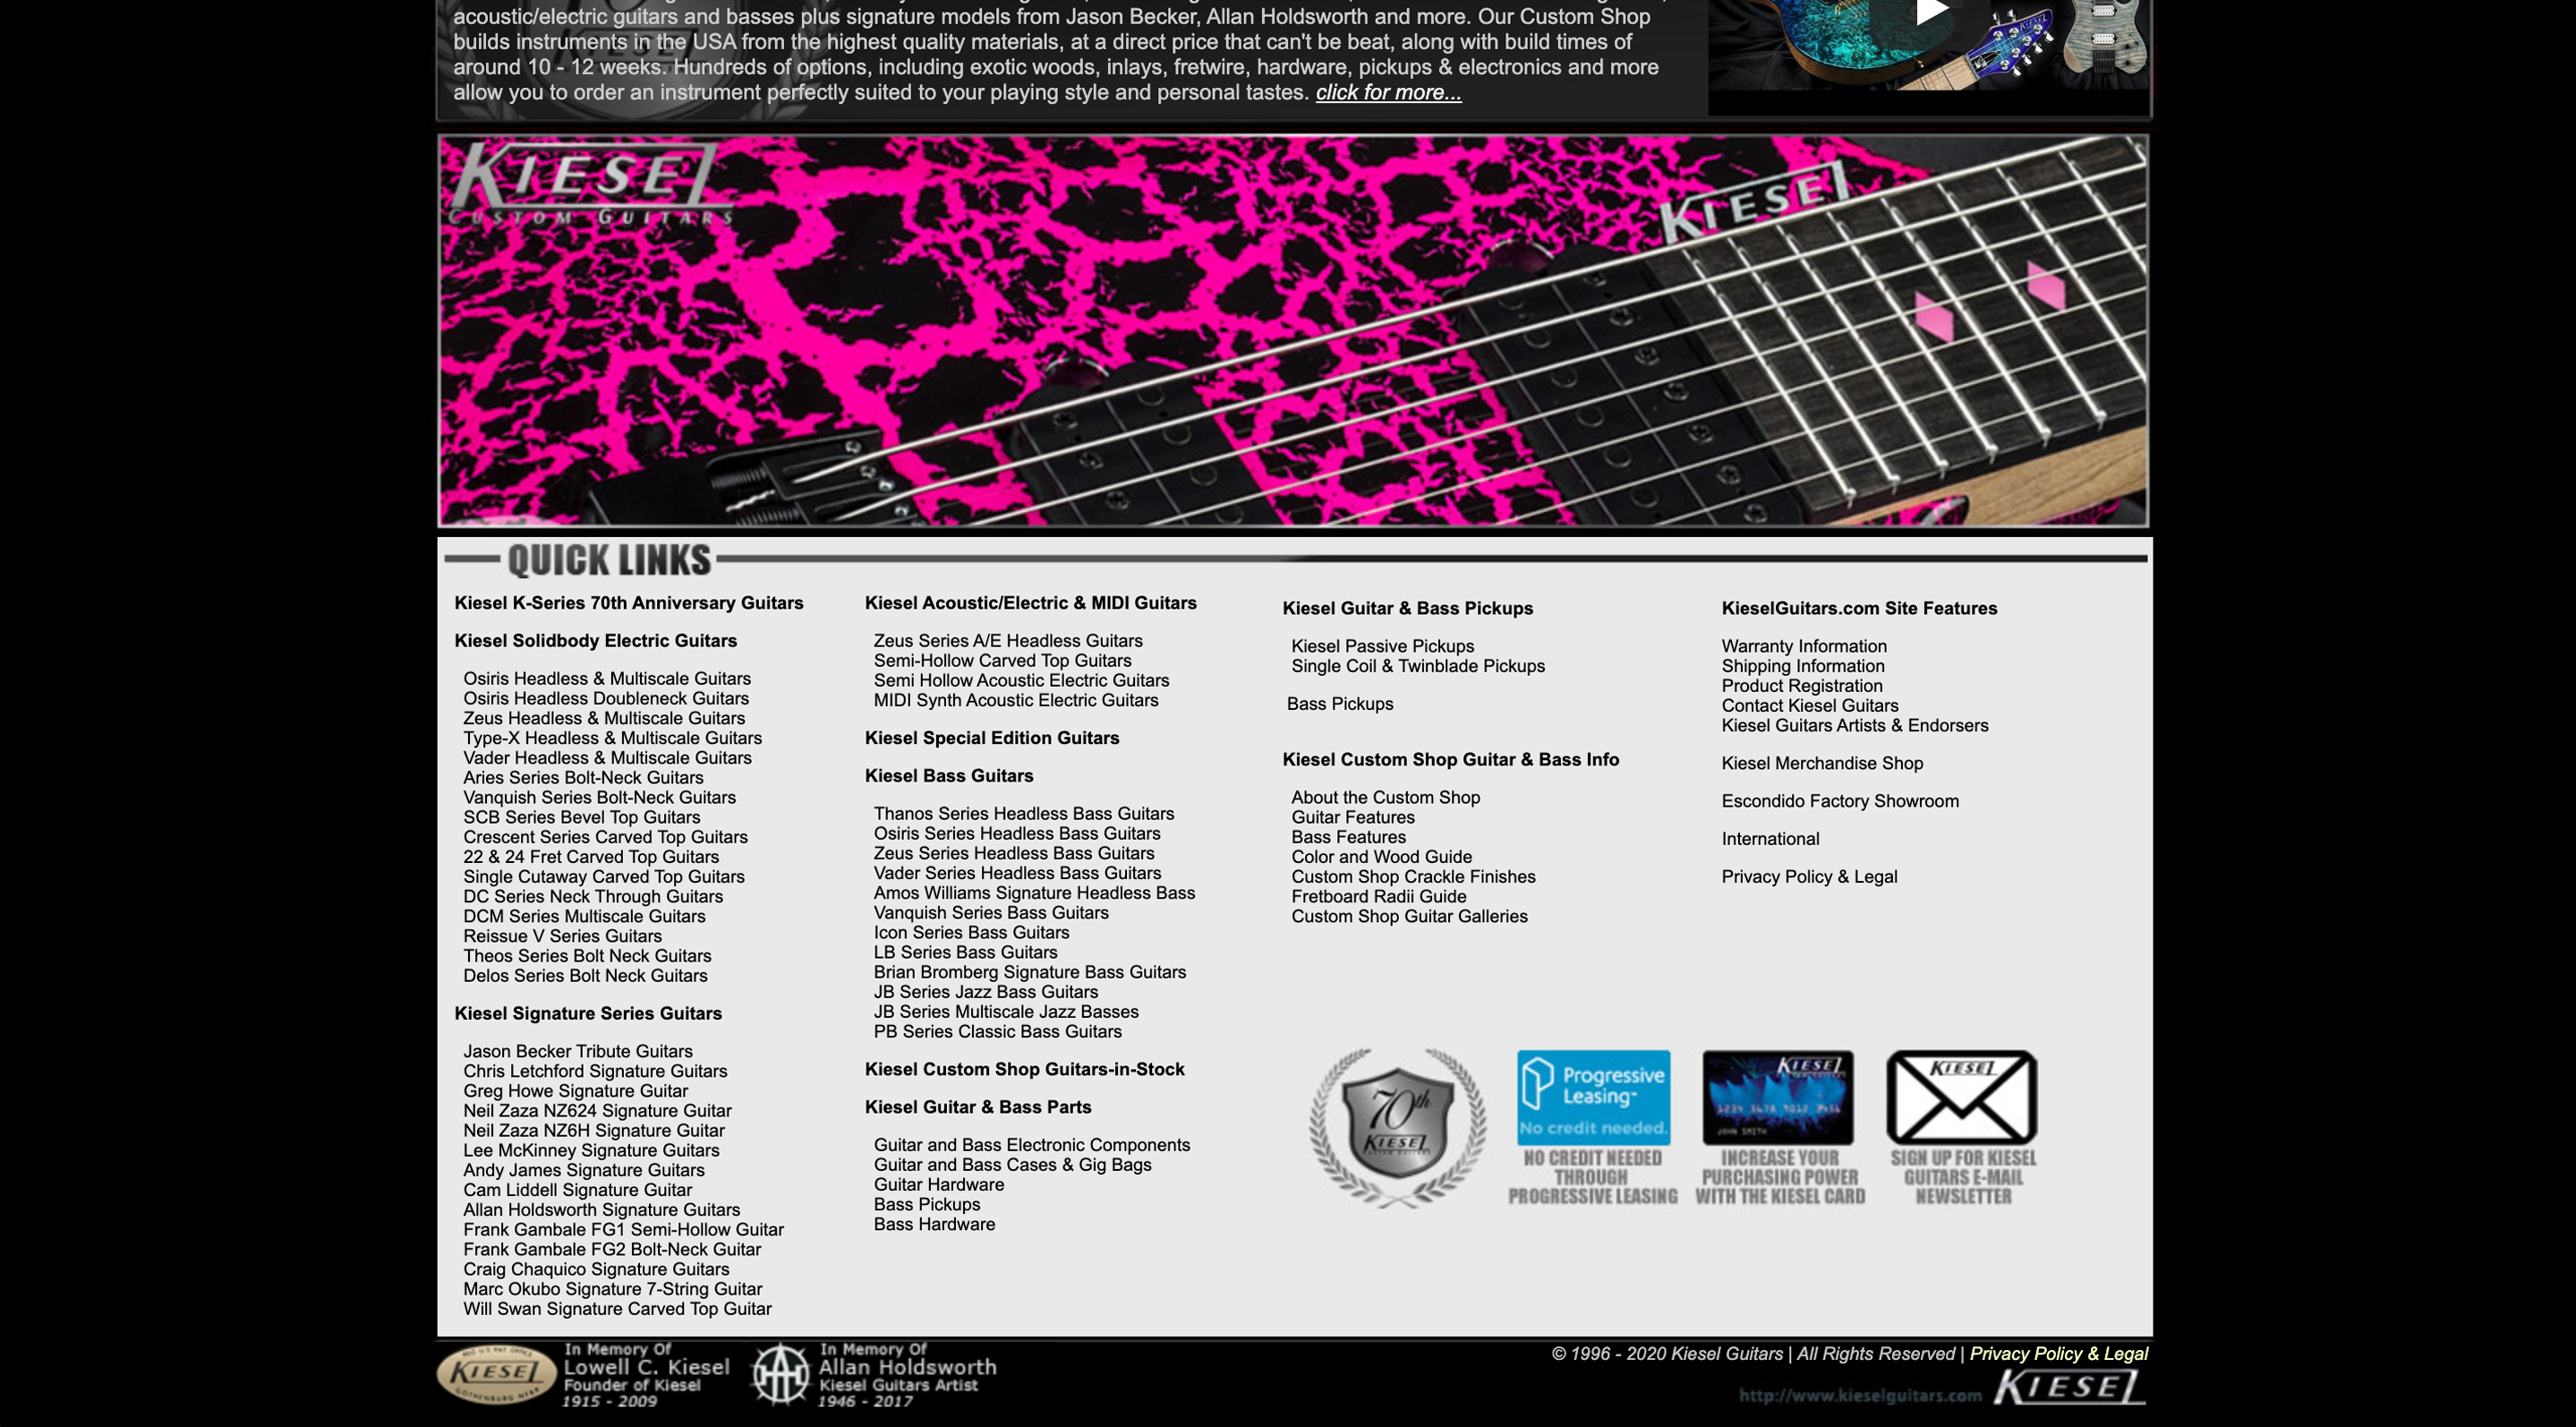 Kiesel guitars' old website (picture 2)